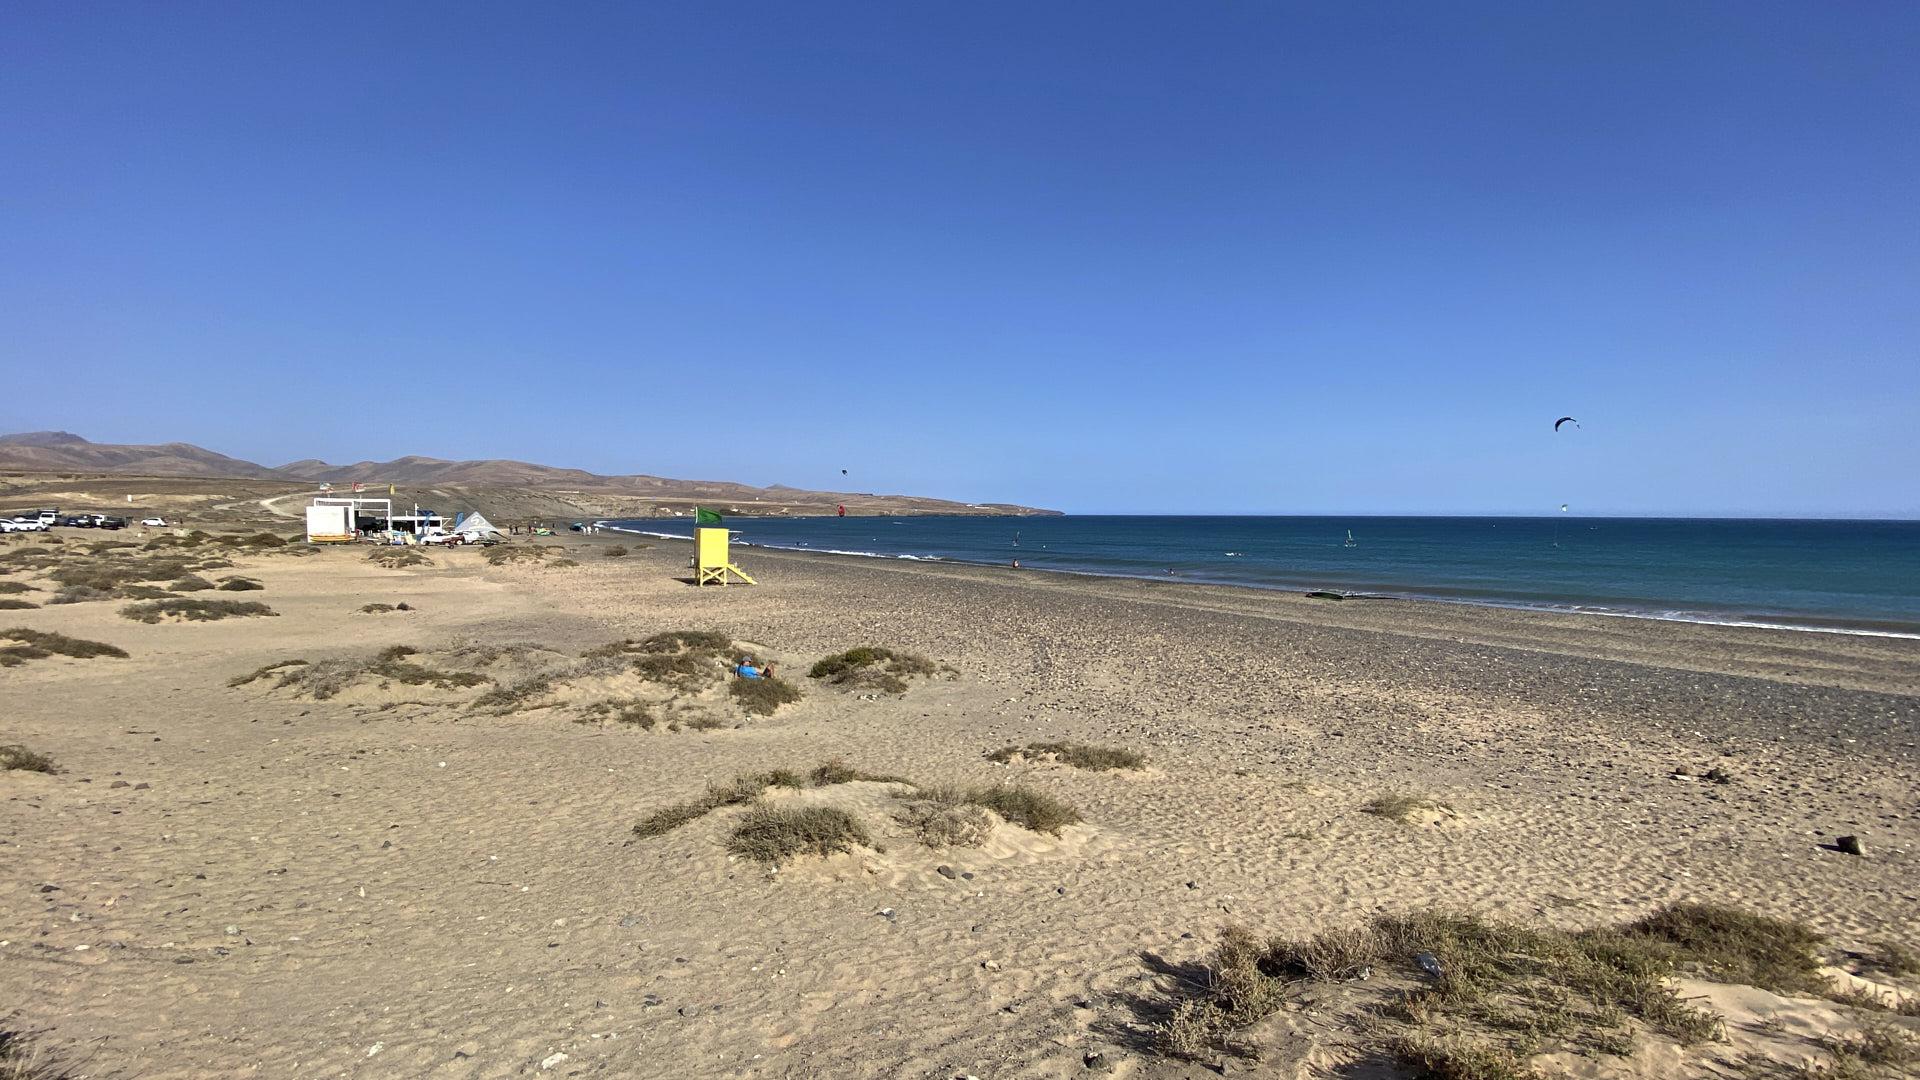 Der Strand Playas de Matas Blancas Costa Calma Fuerteventura.